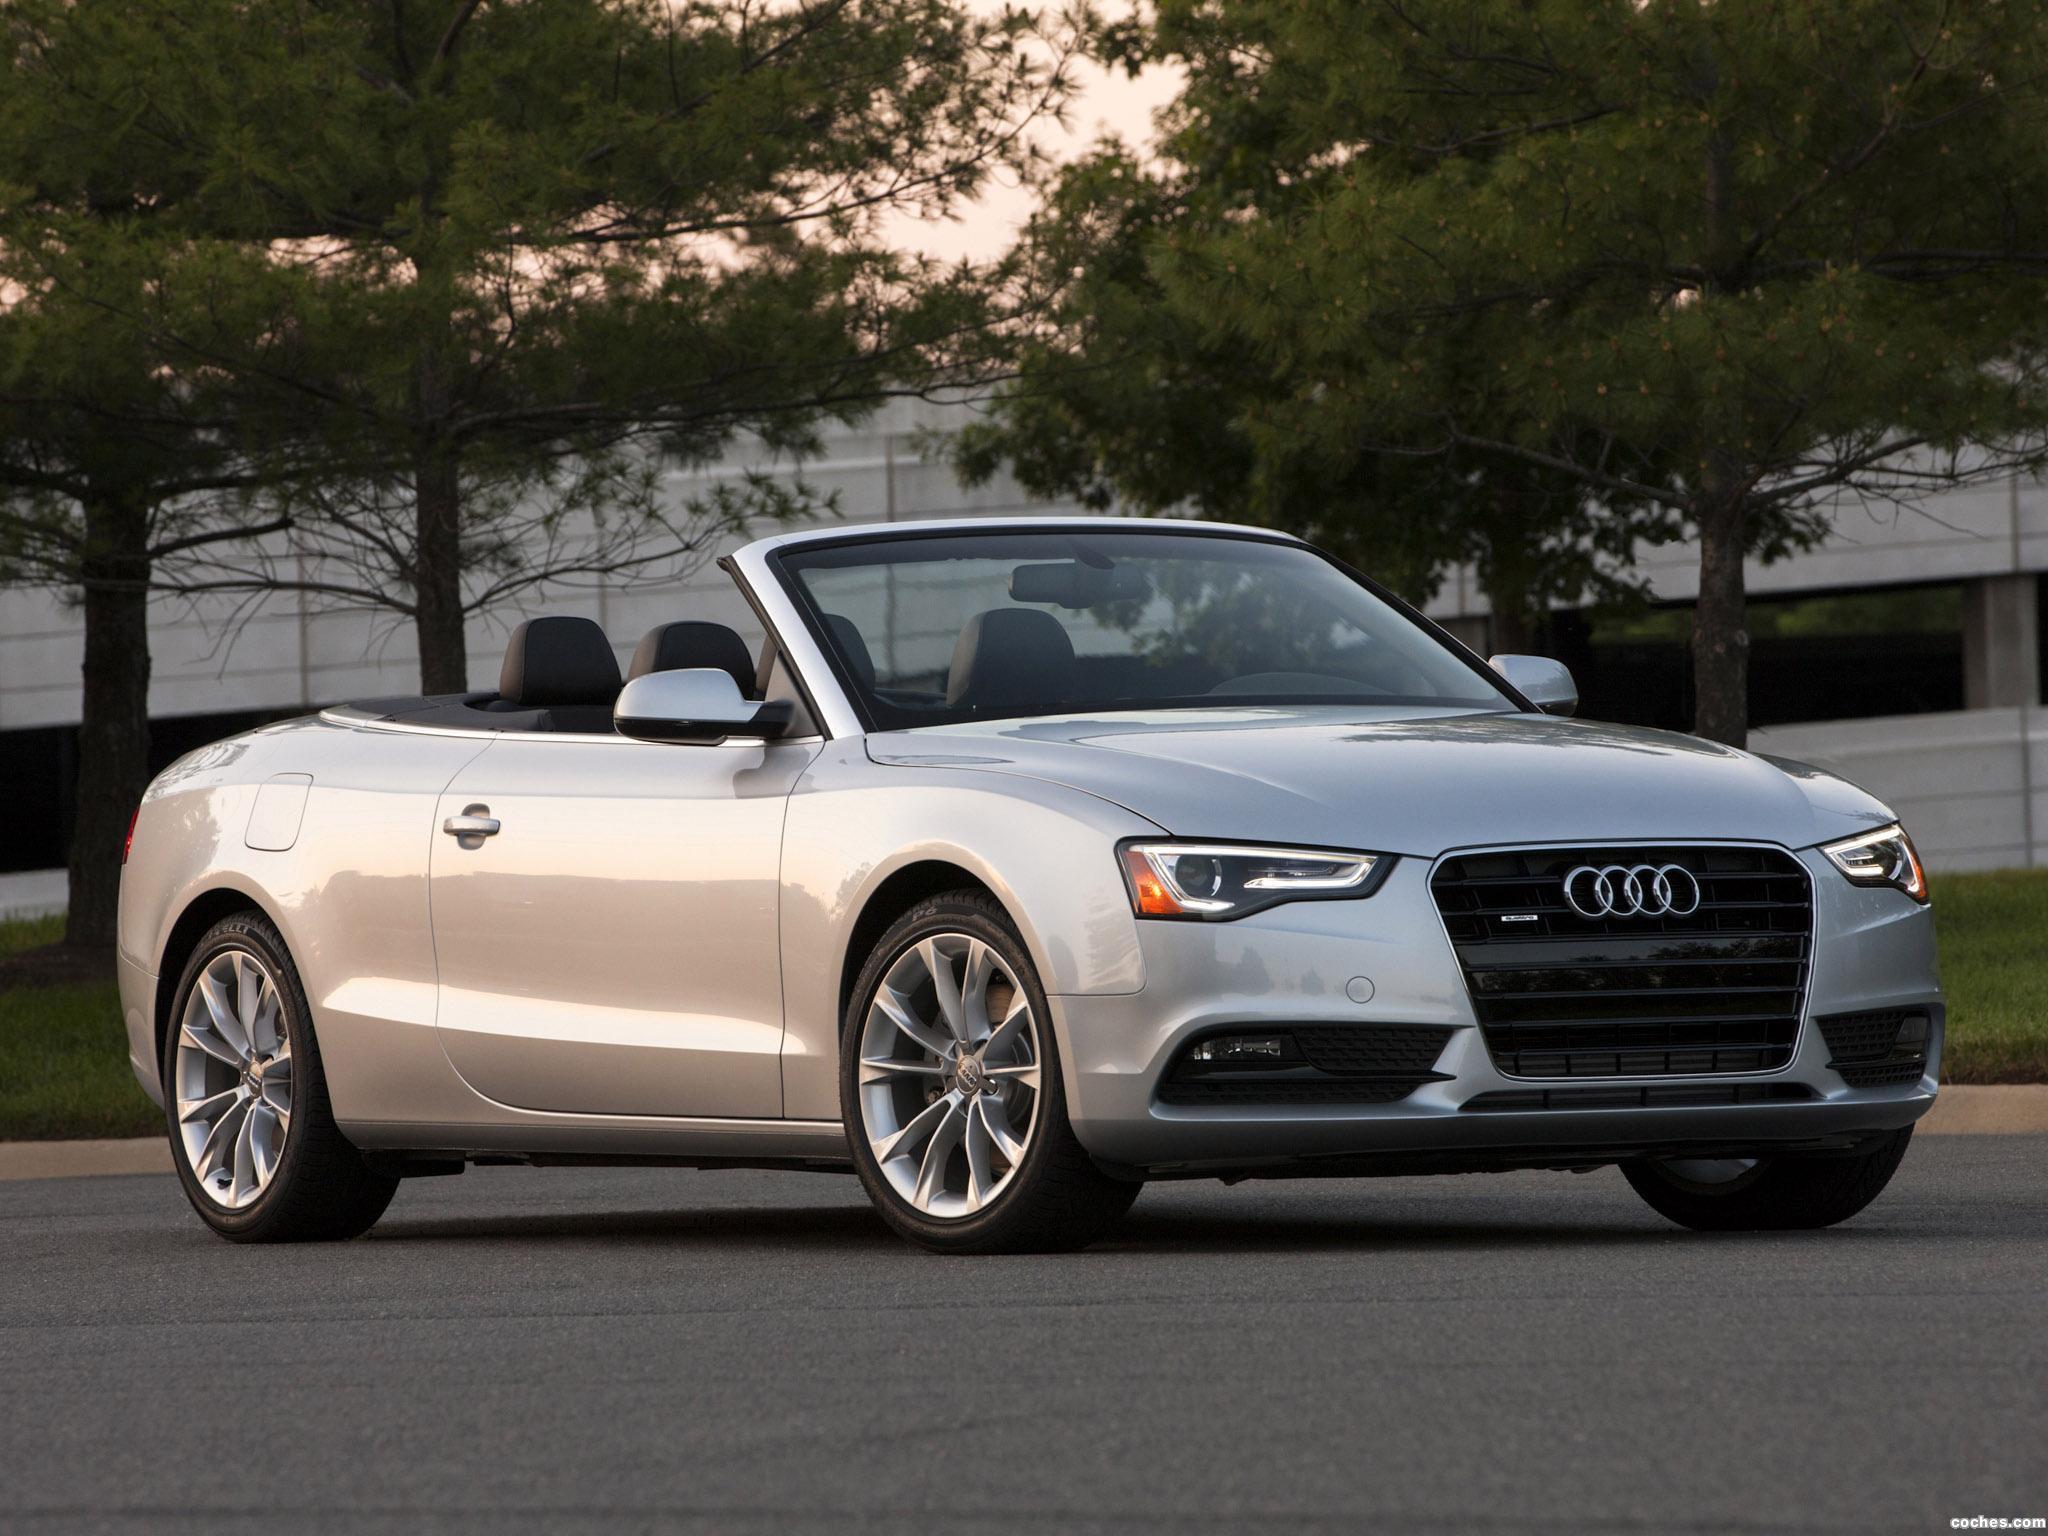 Foto 0 de Audi A5 2.0T Cabriolet USA 2012